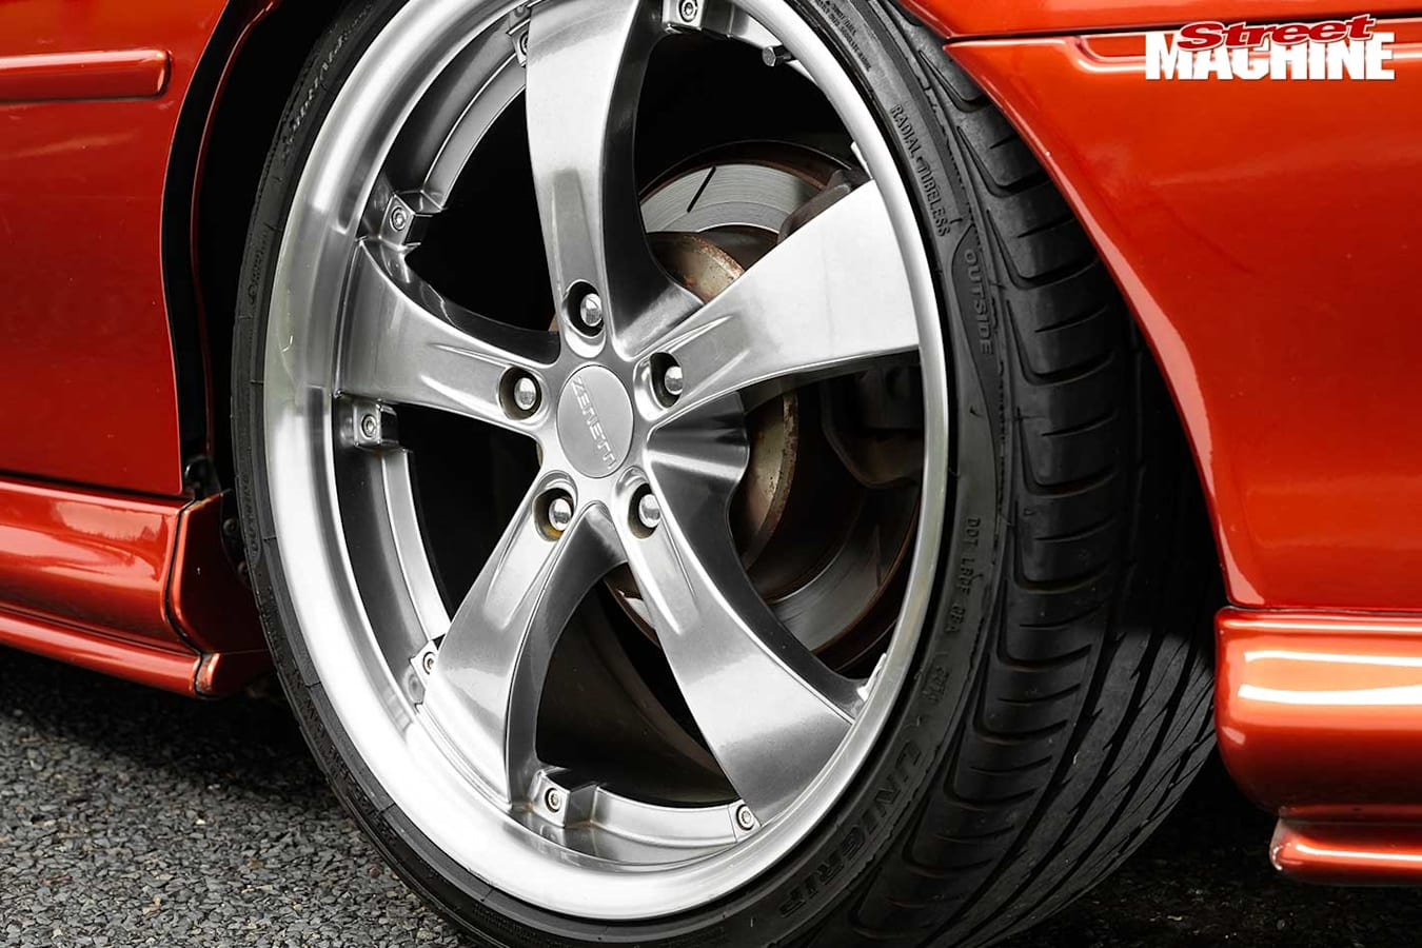 Holden VT Commodore wheel